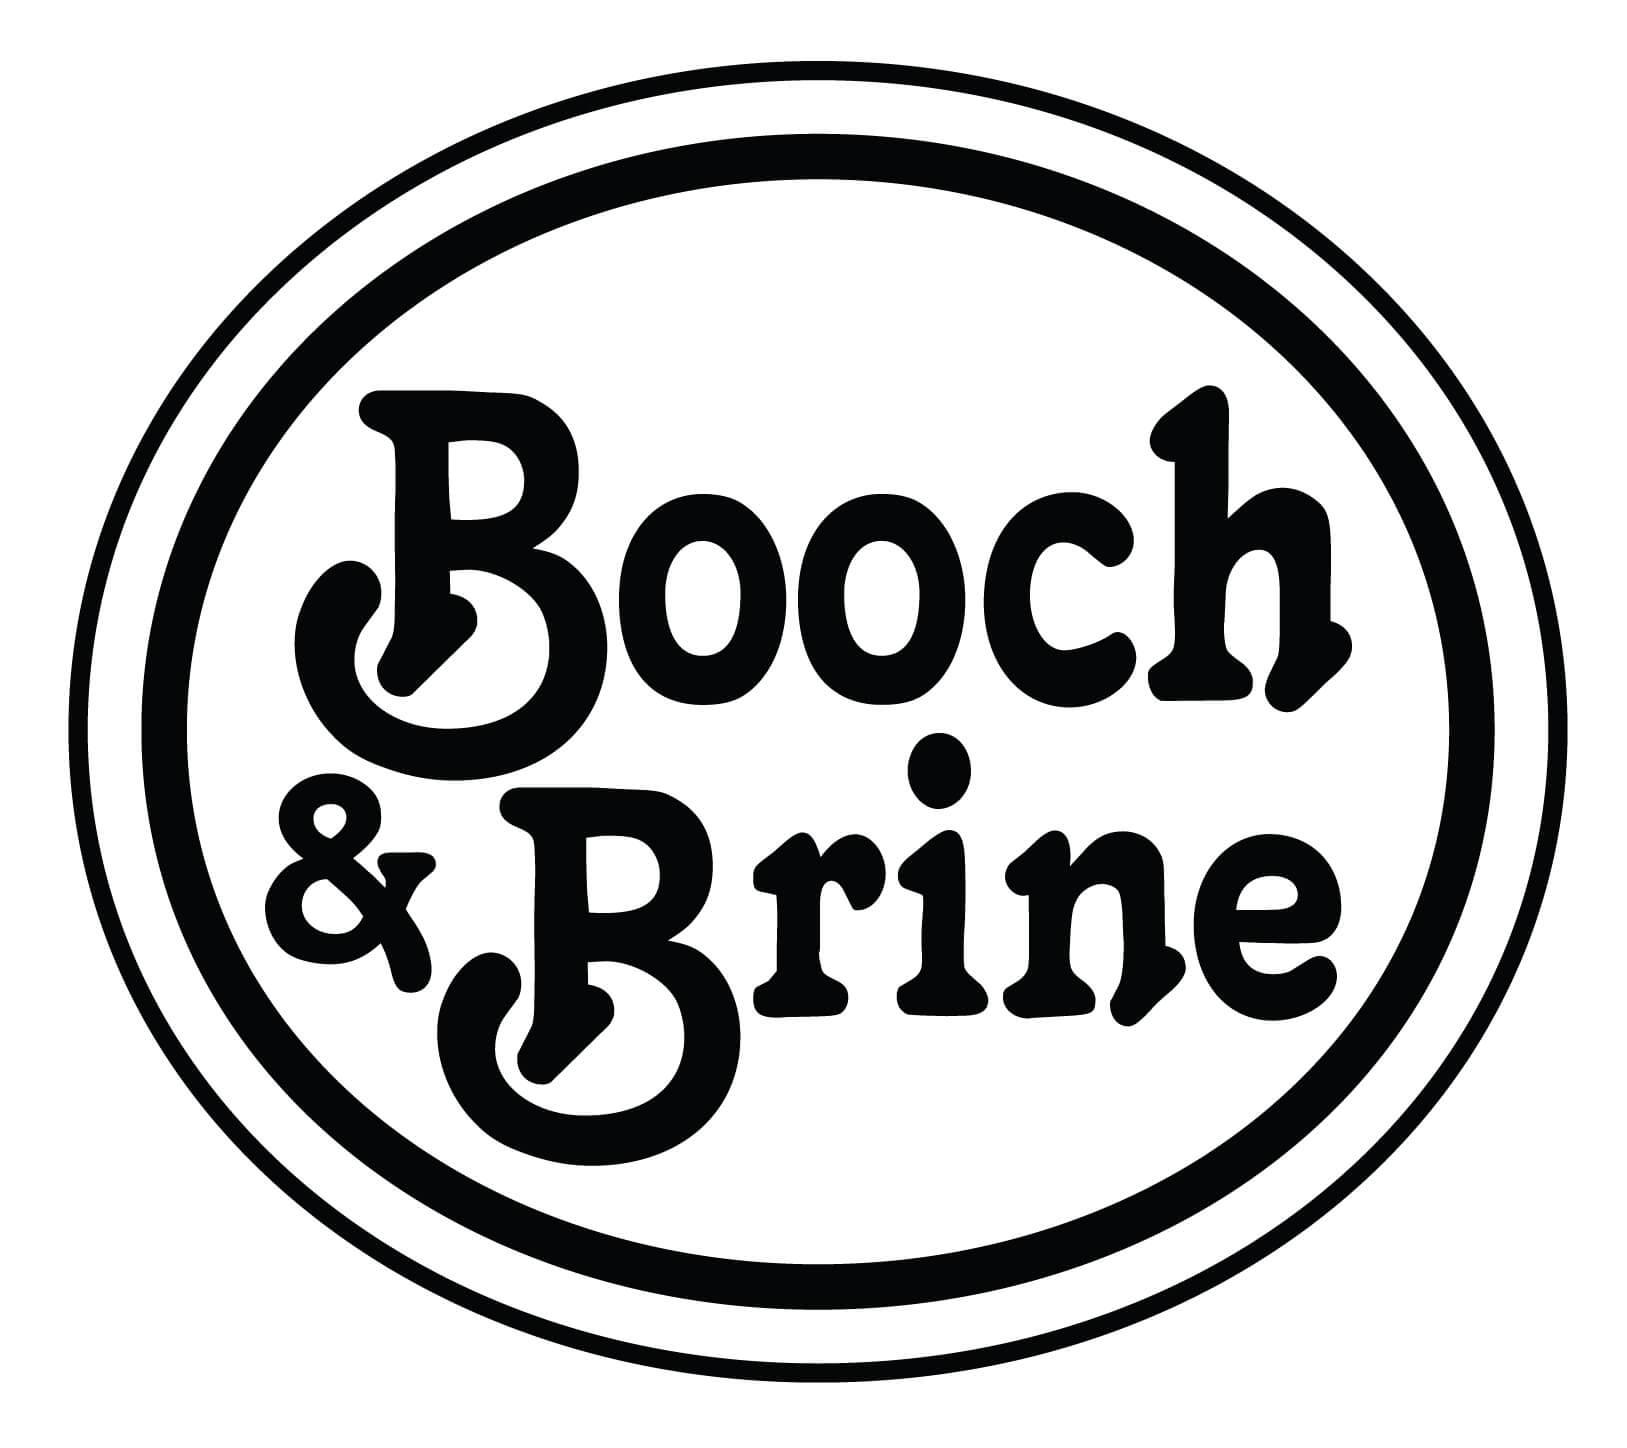 Booch & Brine: Buy Kimchi, Kraut and Kombucha